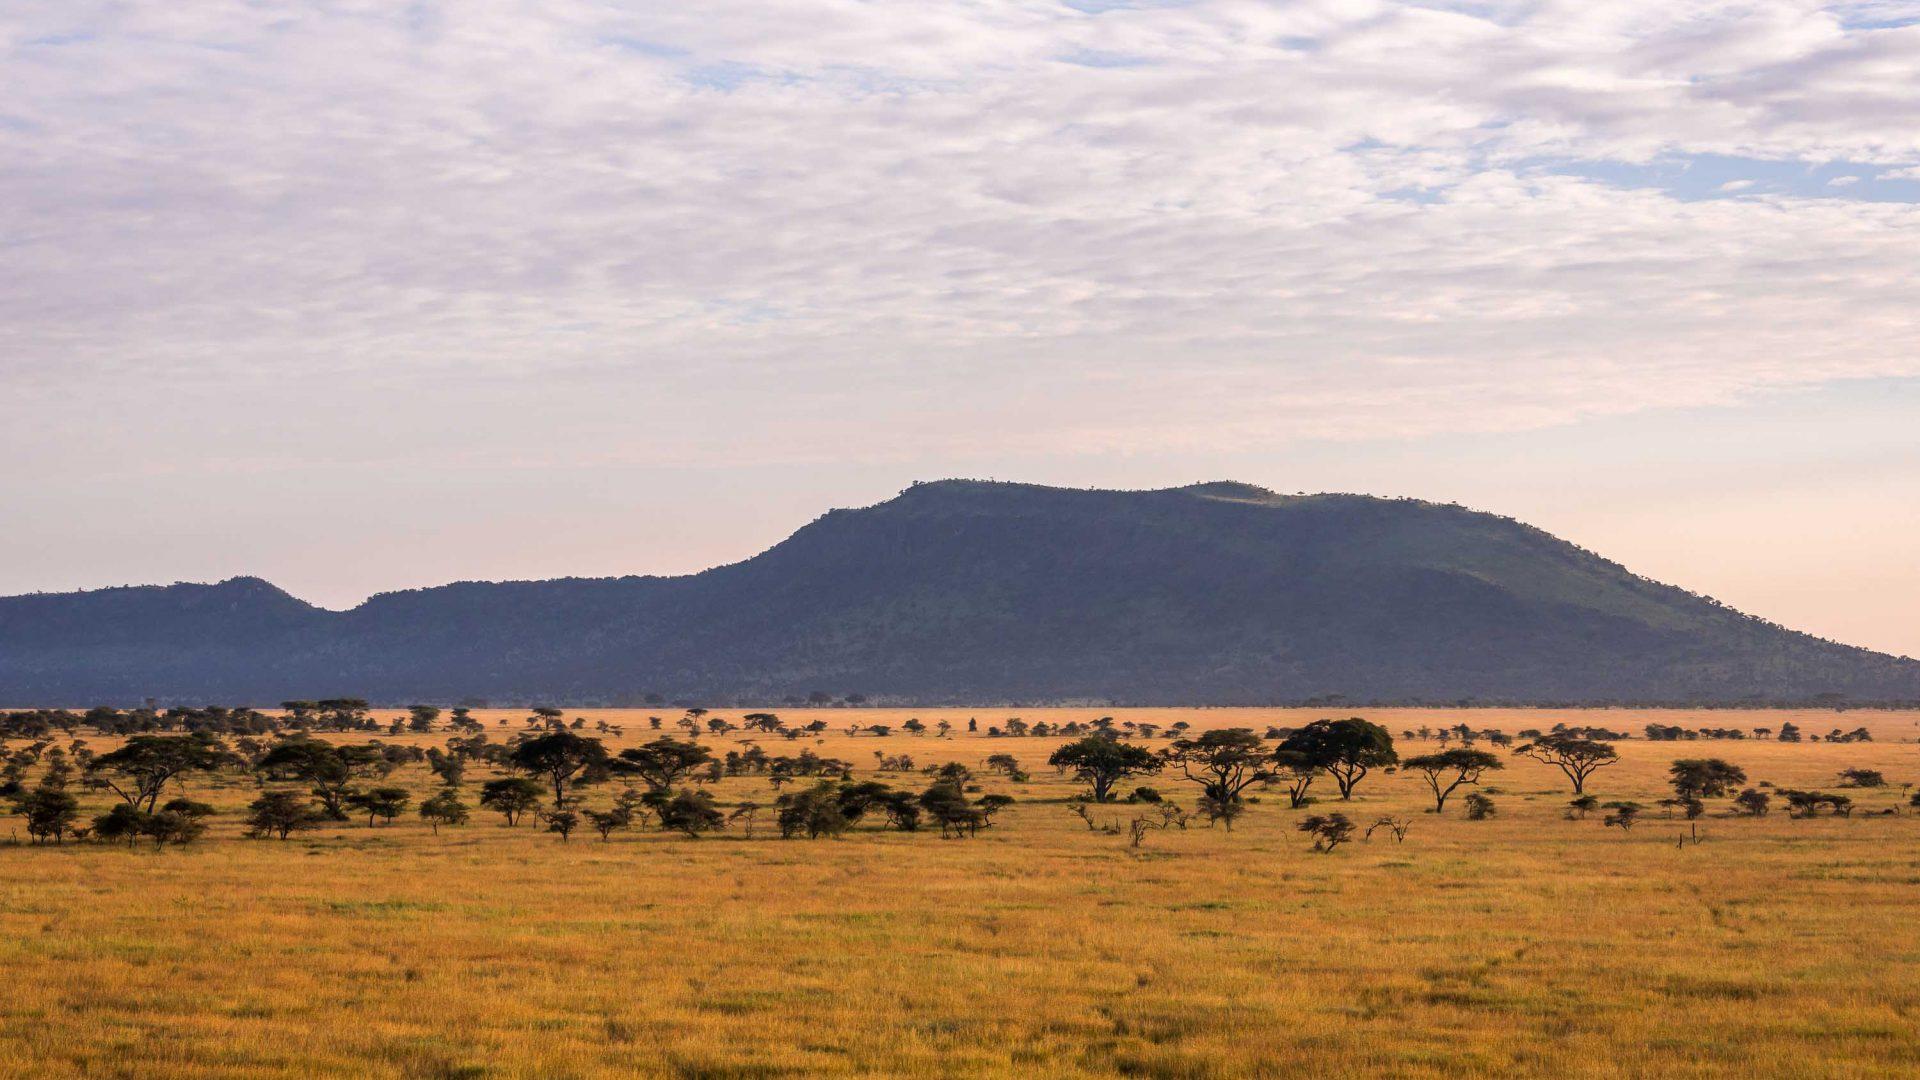 The vast plains of the Serengeti, Tanzania, at dawn.